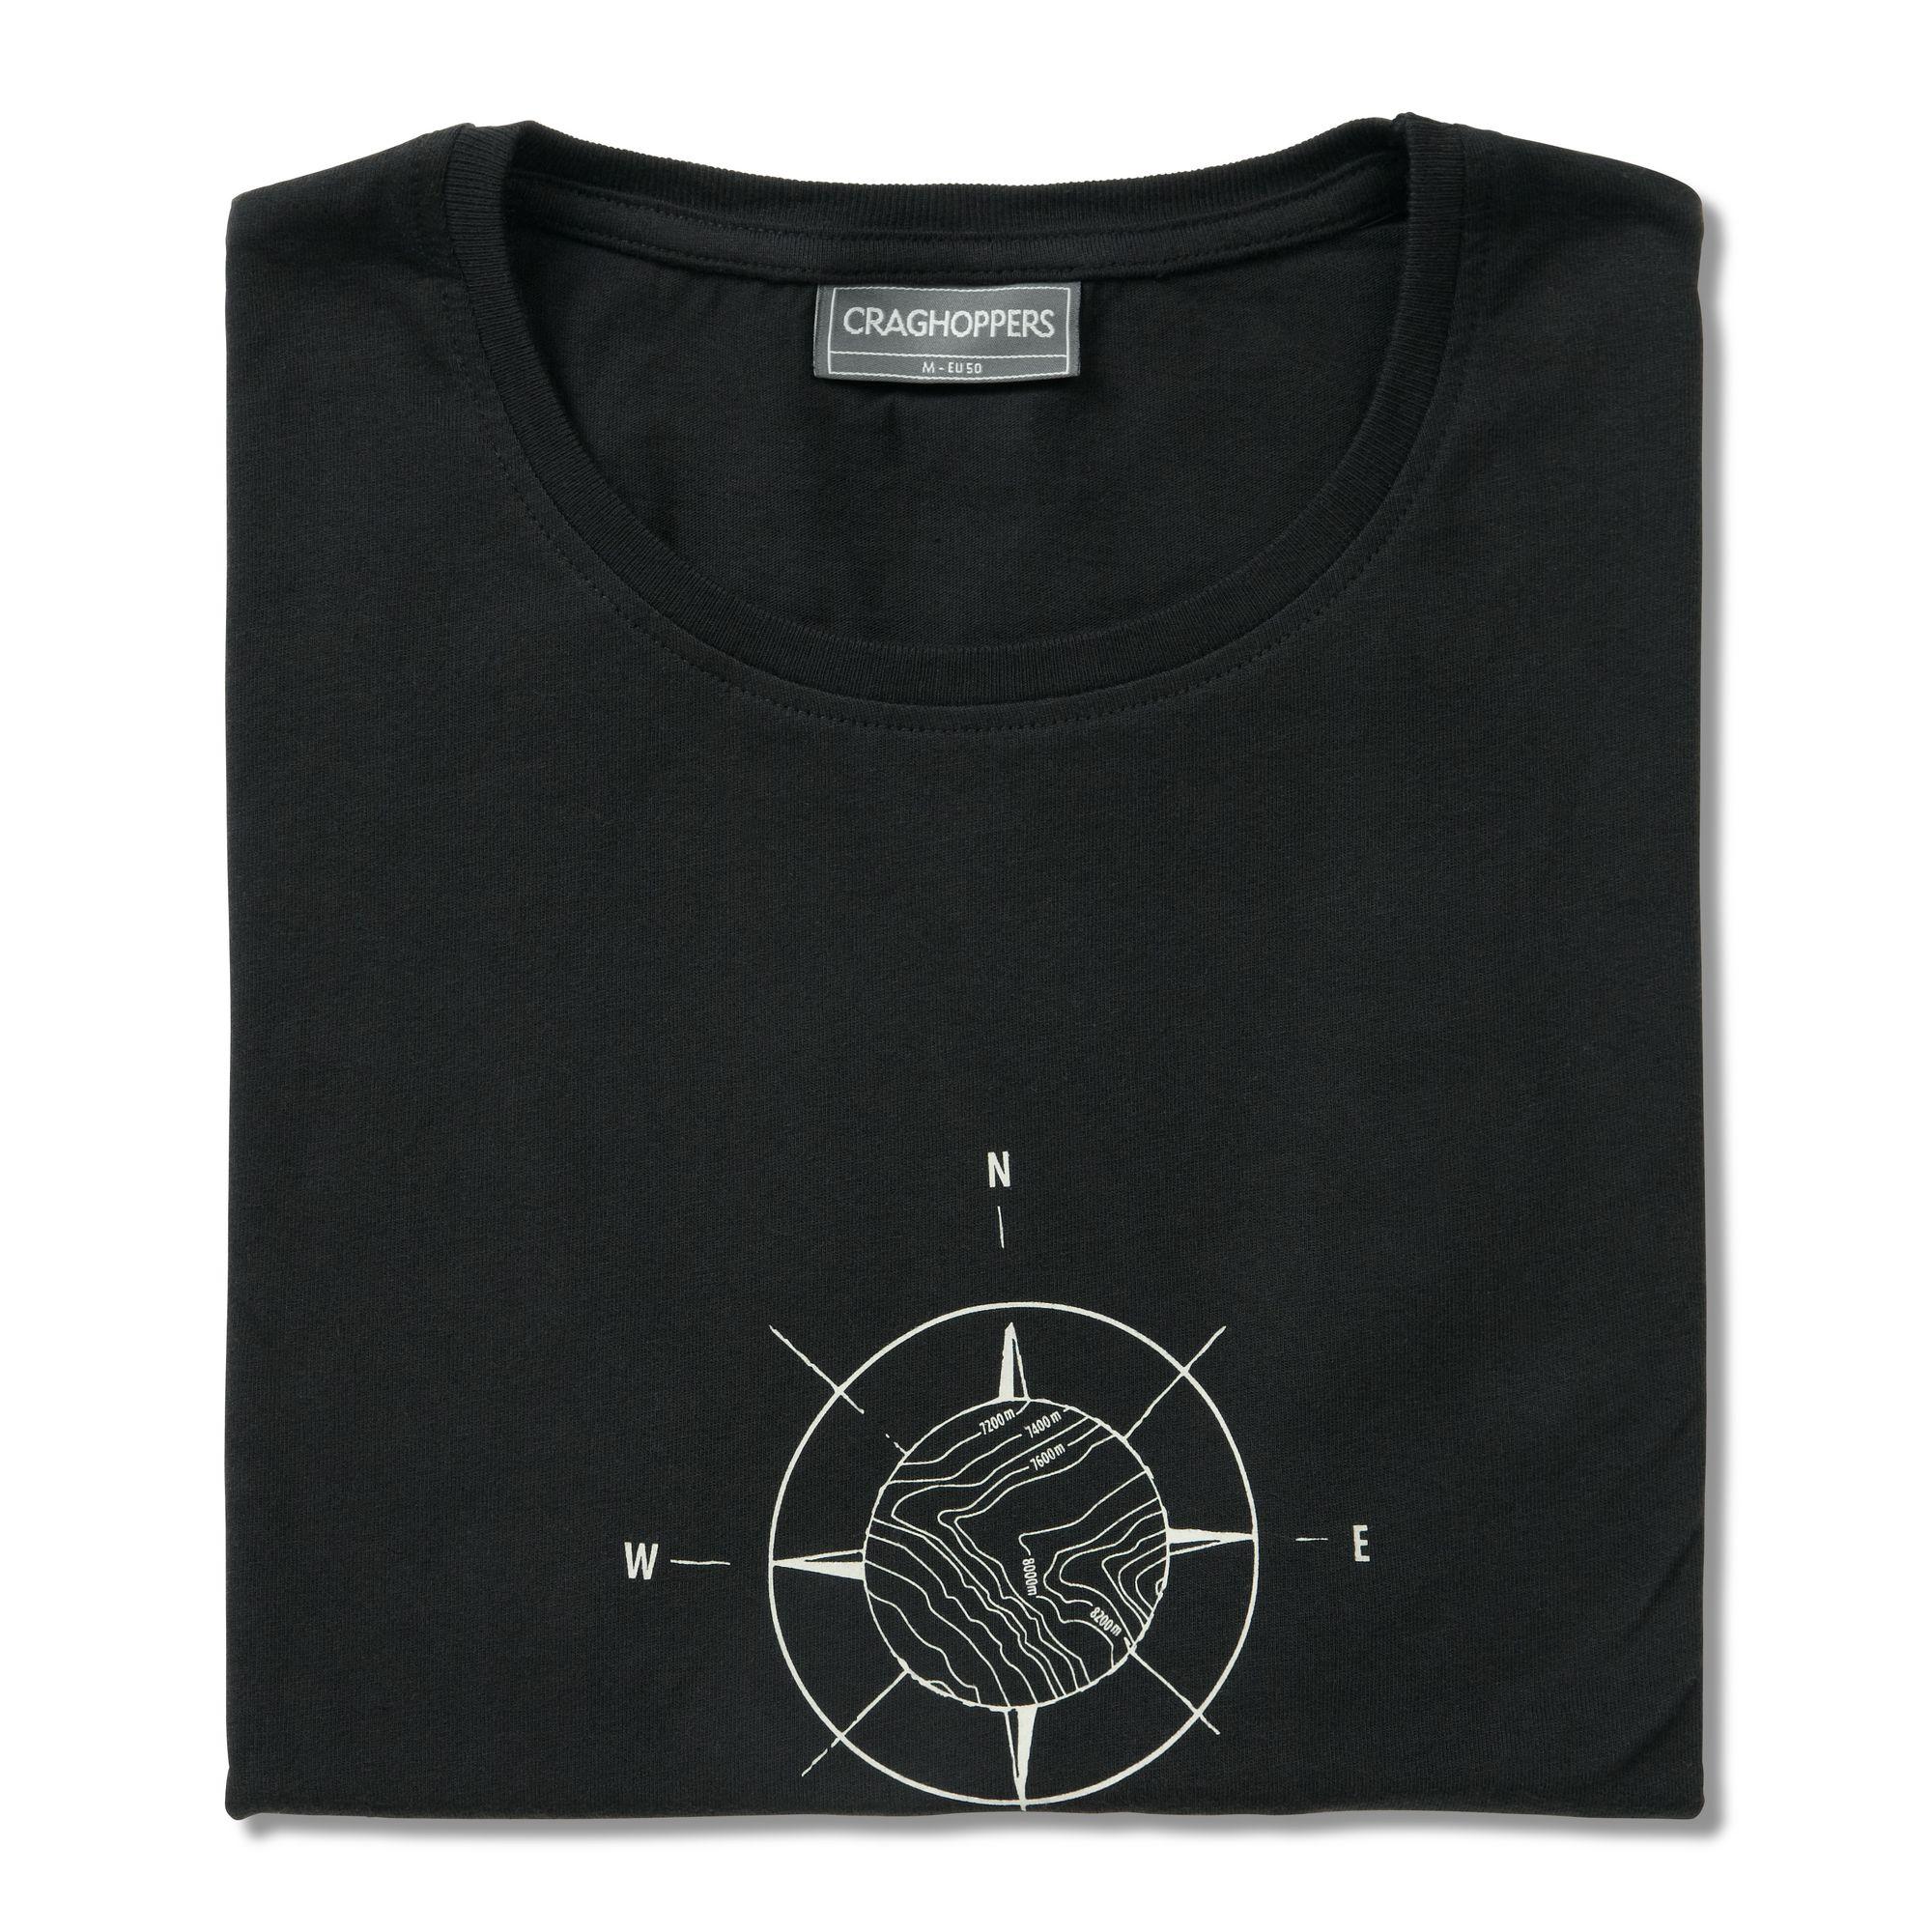 Craghoppers-Camiseta-impresion-grafica-manga-corta-Modelo-Eastlake-CG599